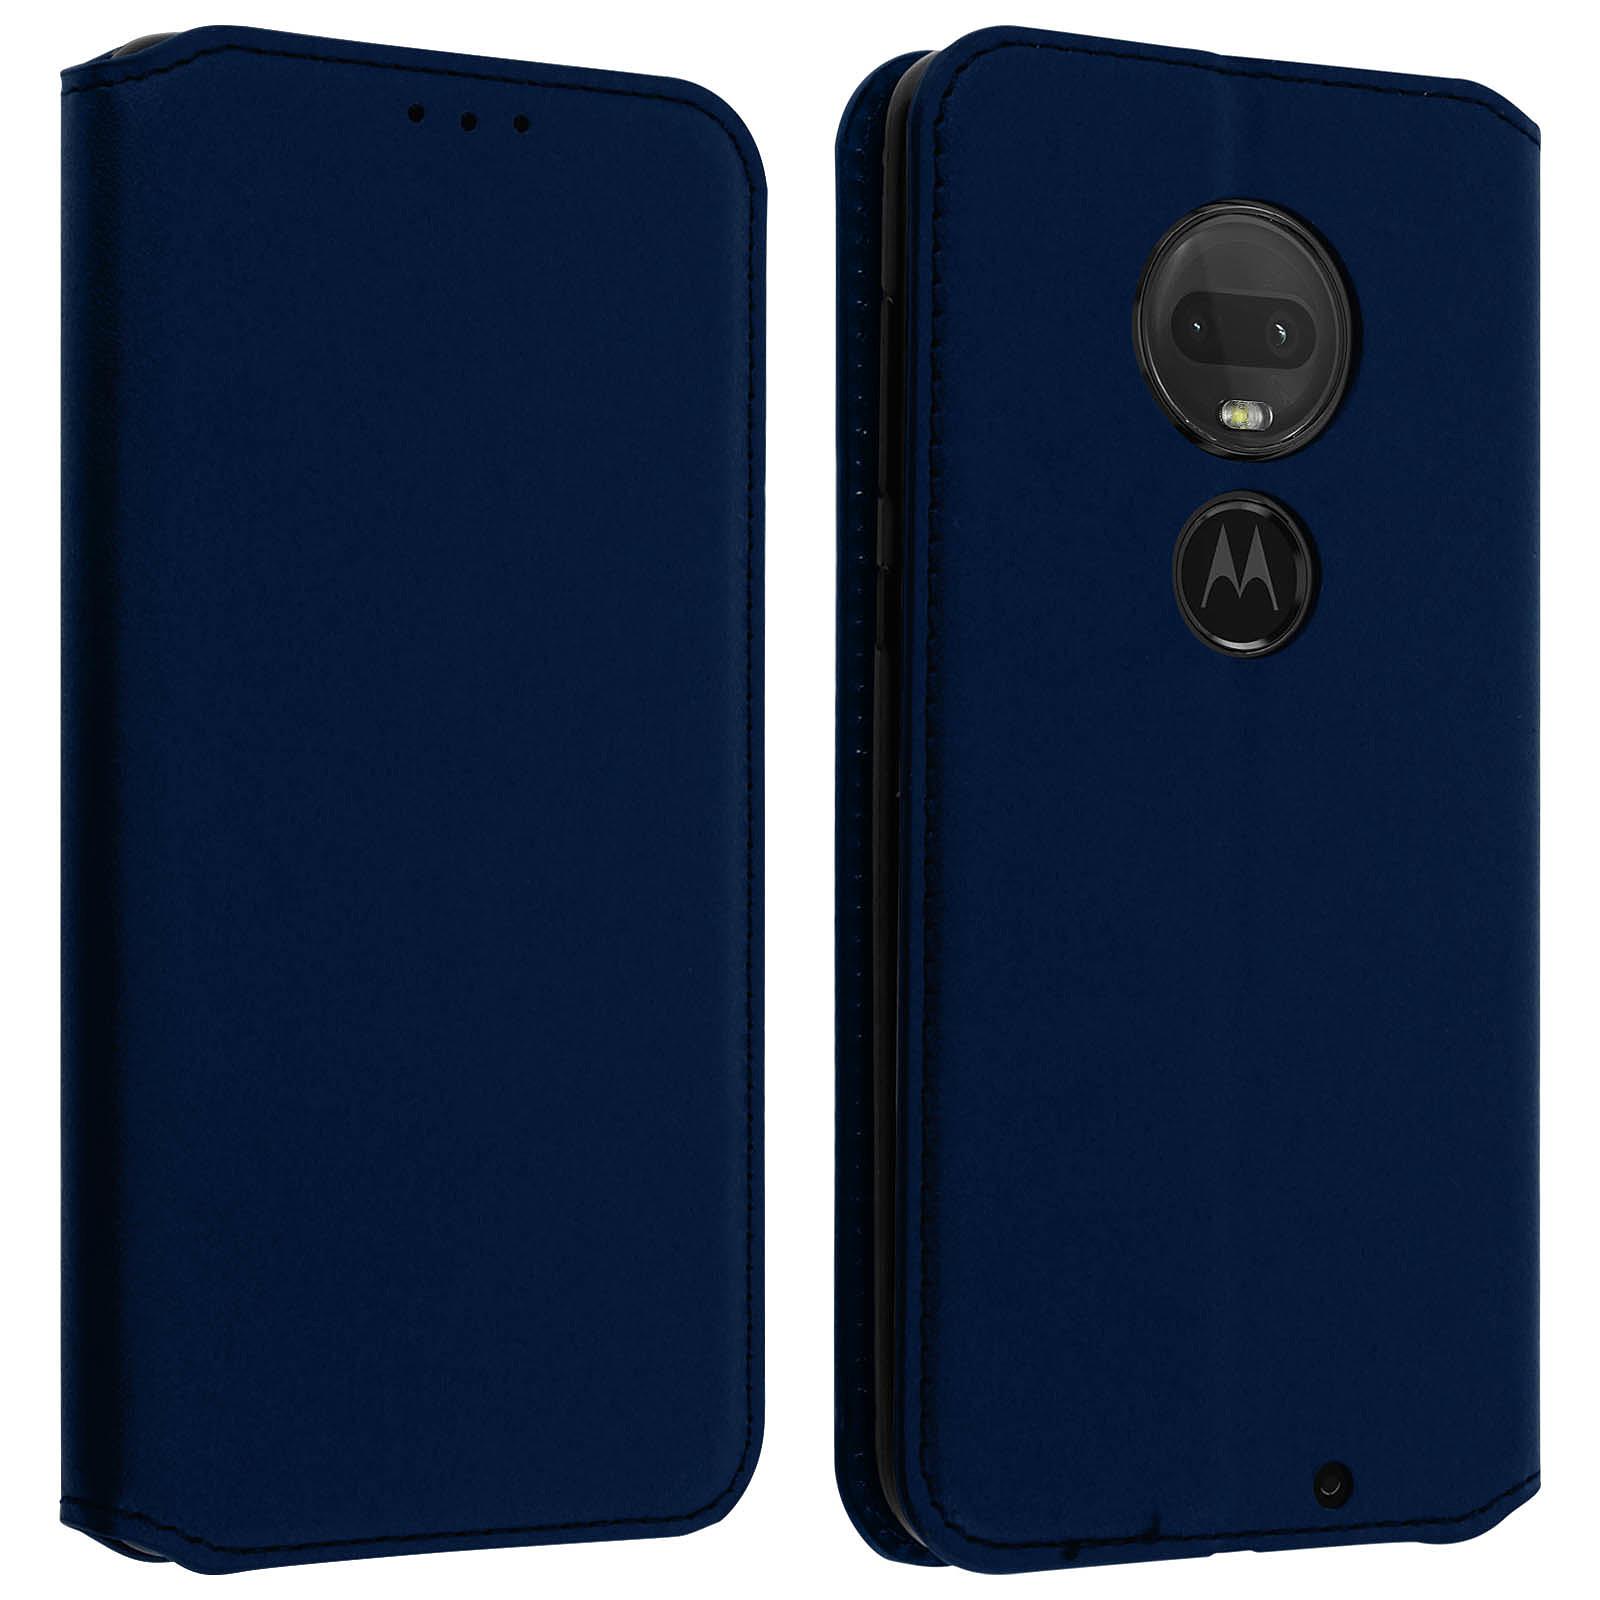 Avizar Etui folio Bleu Nuit pour Motorola Moto G7 Power